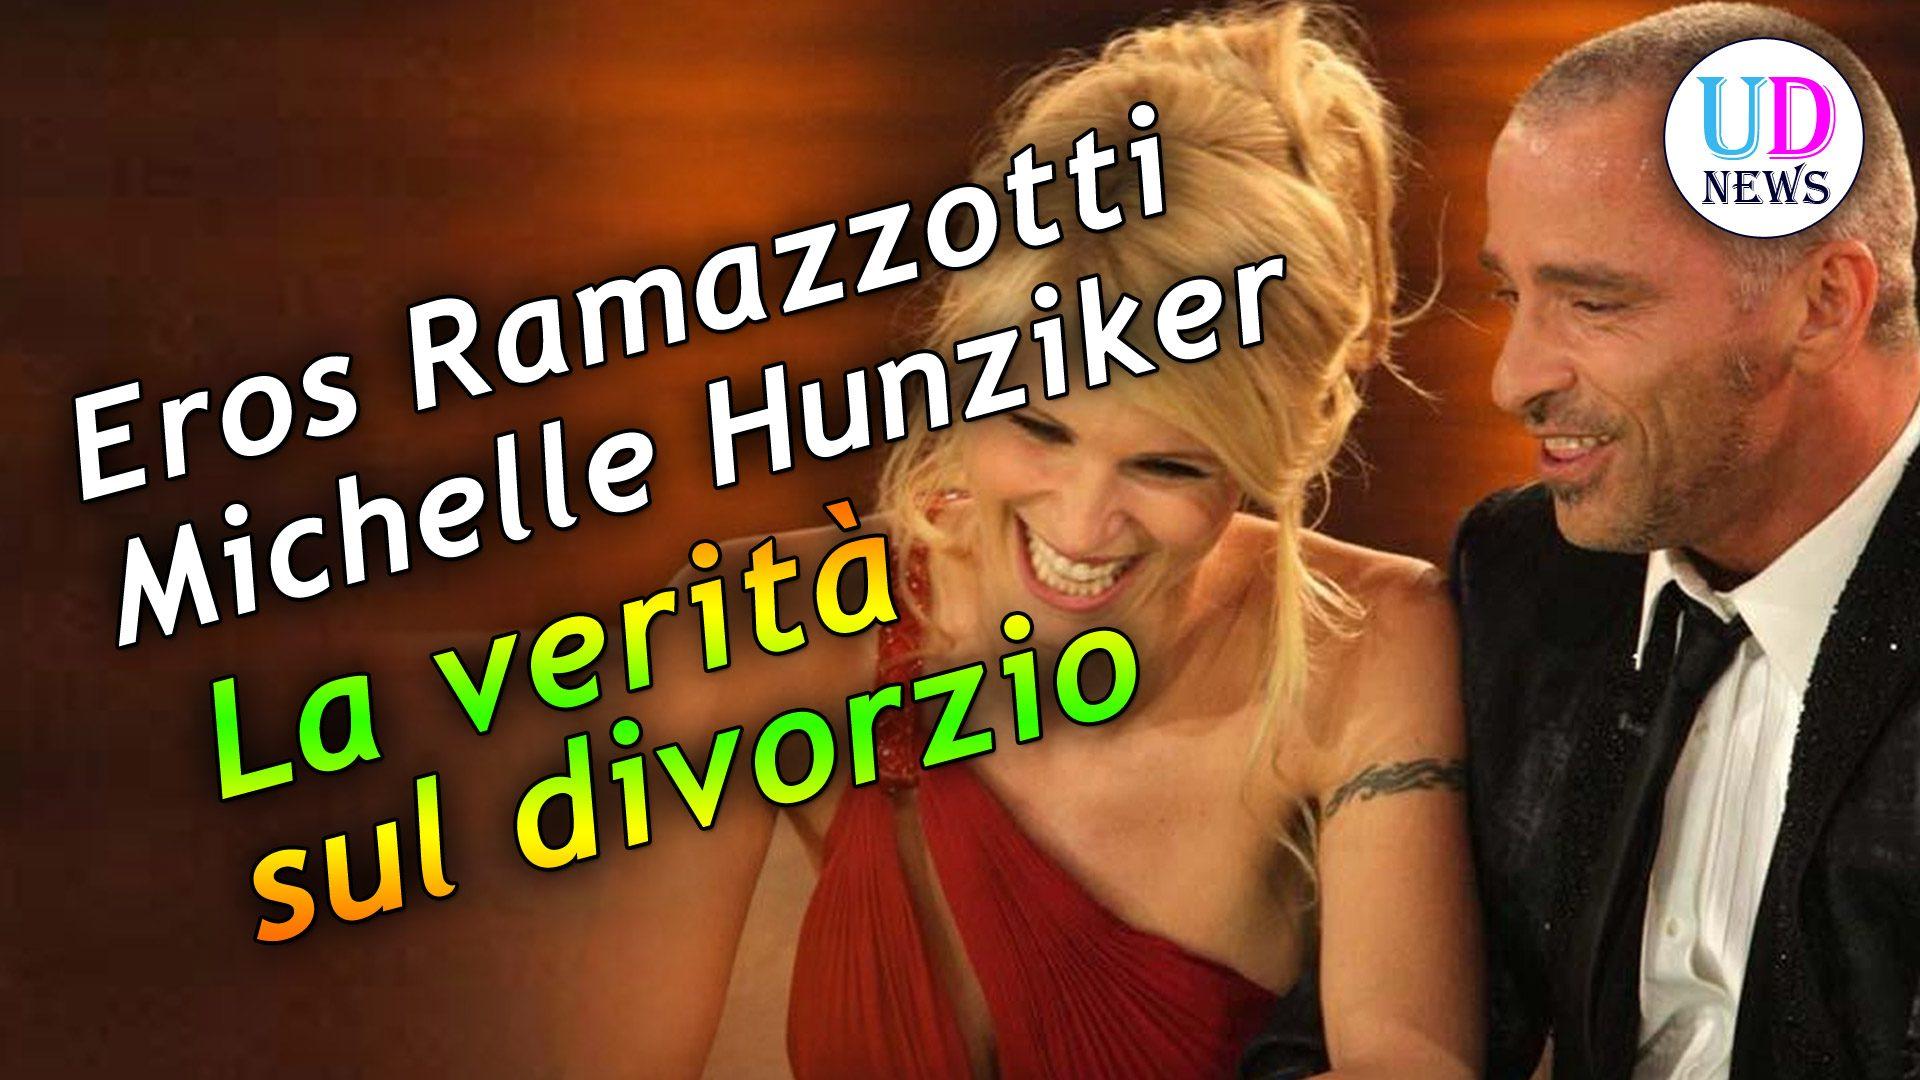 Michelle Hunziker and Eros Ramazzotti - Dating, Gossip